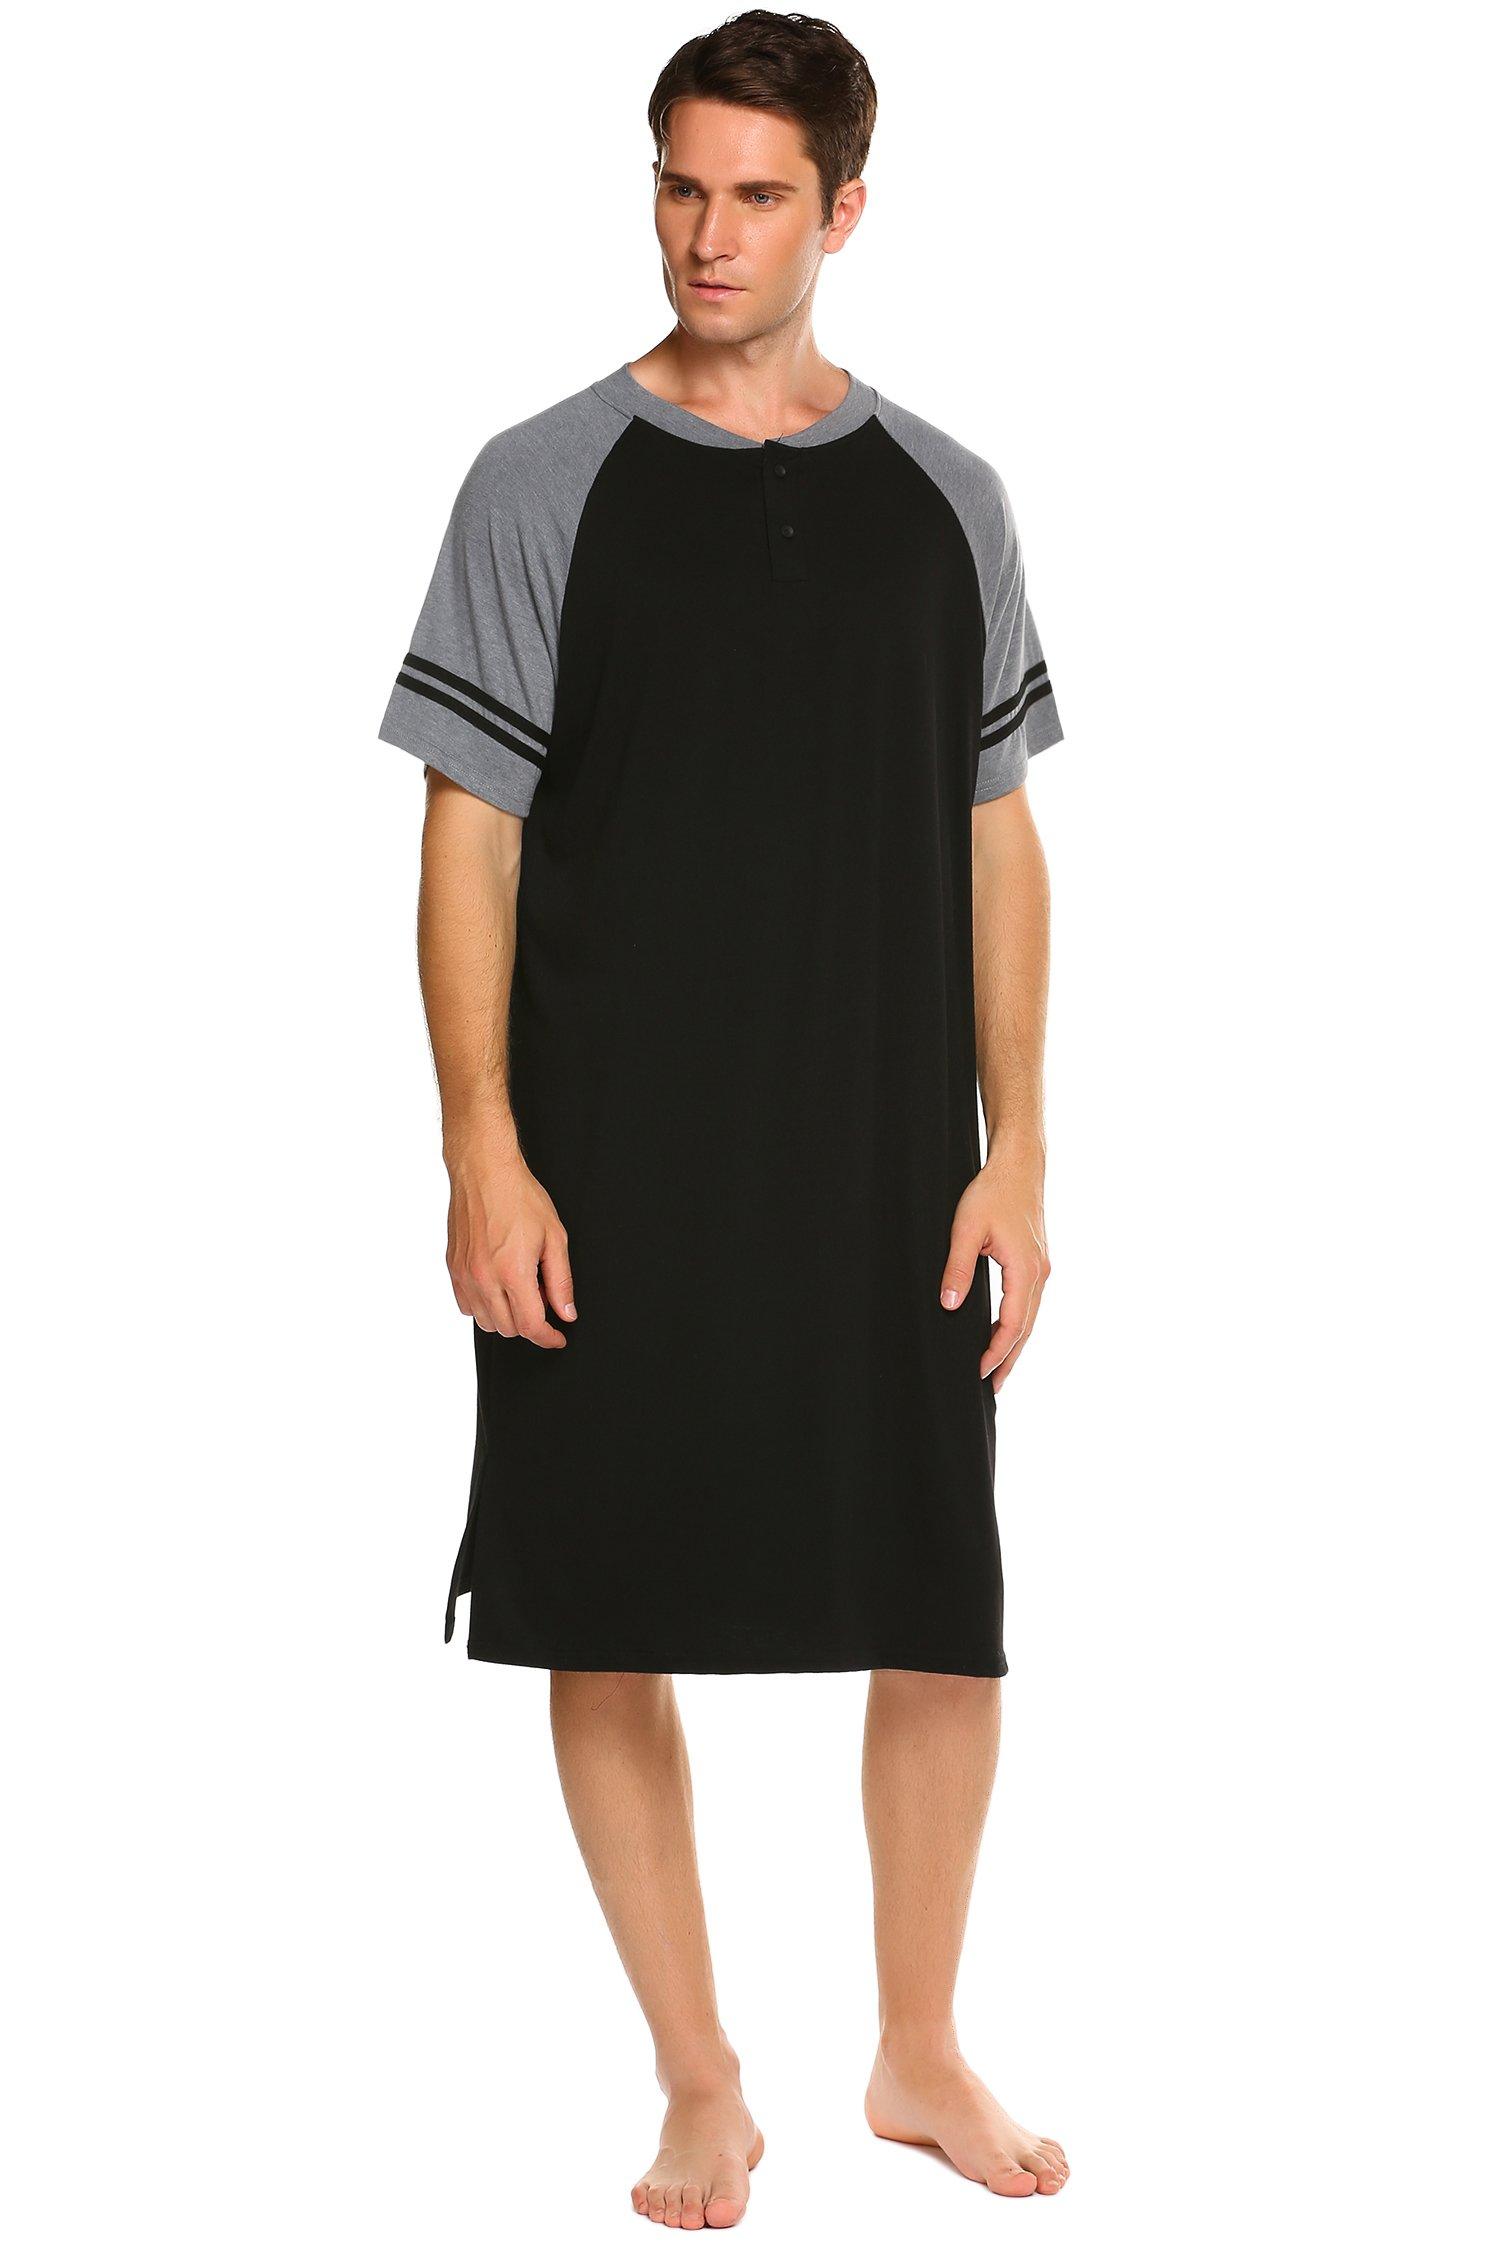 Ekouaer Men's Sleepwear Cotton Loungewear Soft Nightshirt (Black, X-Large)